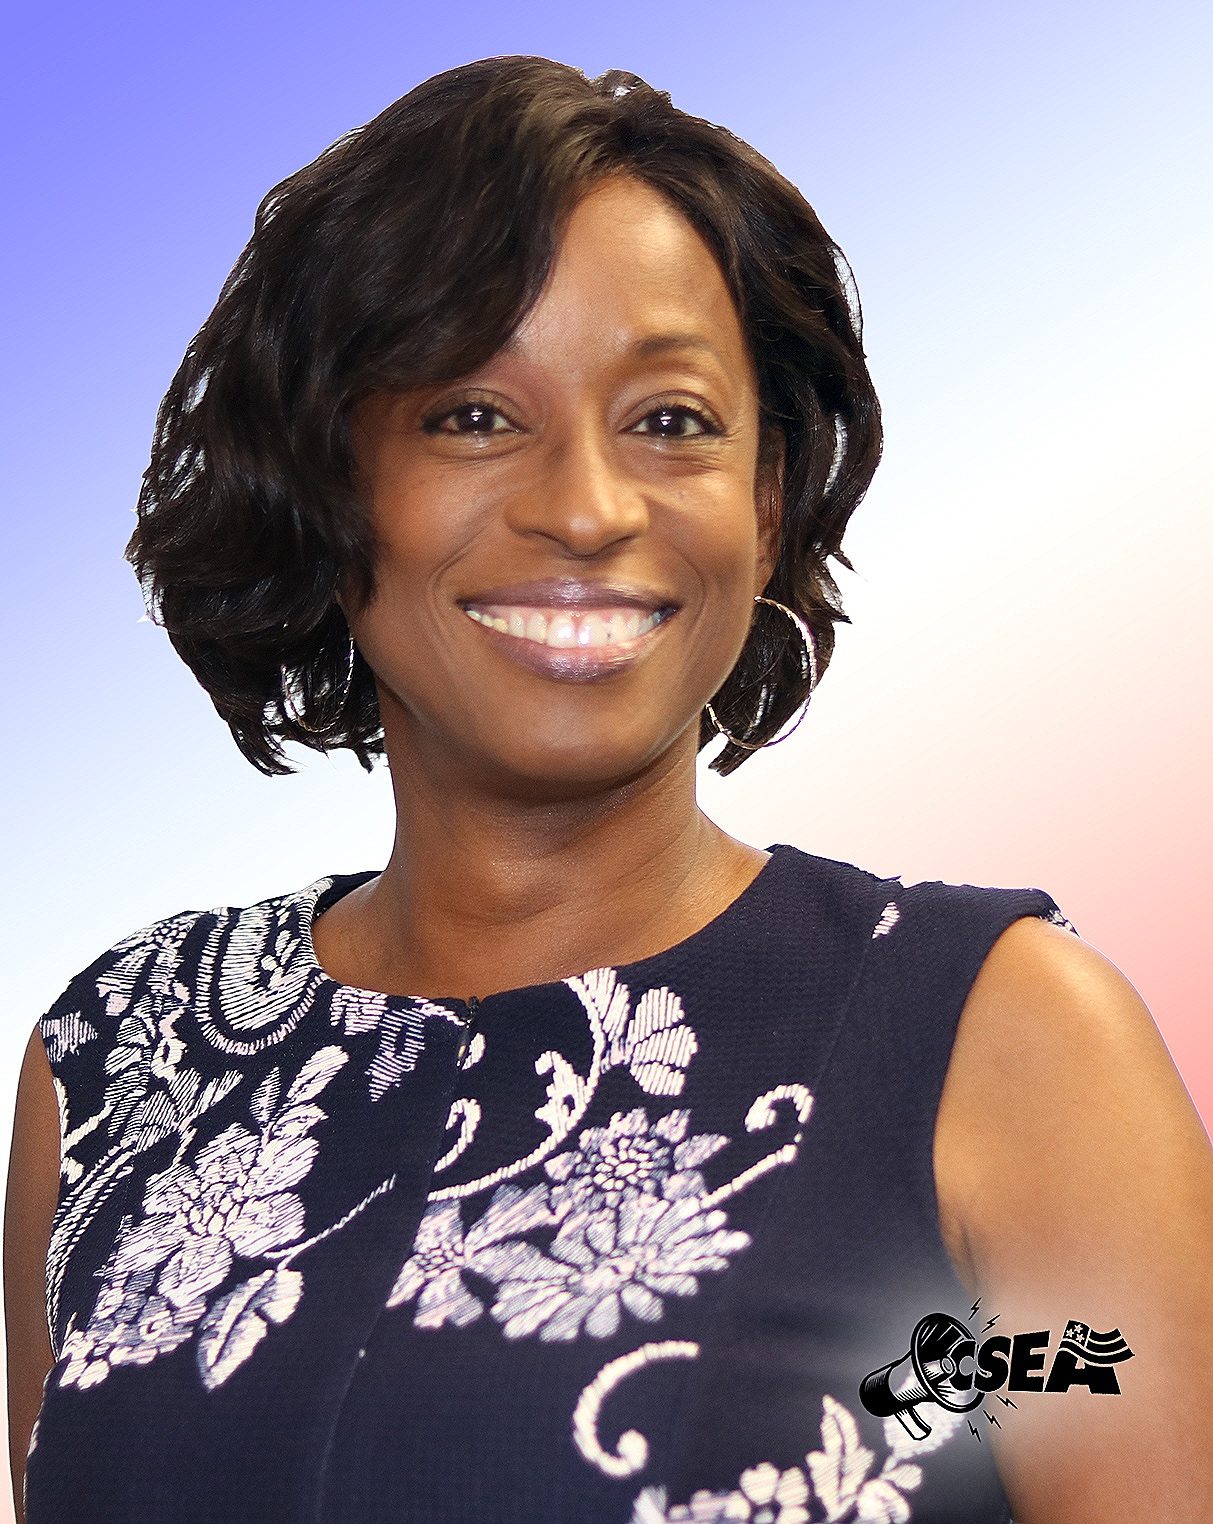 Yvette Gaynor - CSEA Local 830 Vice President